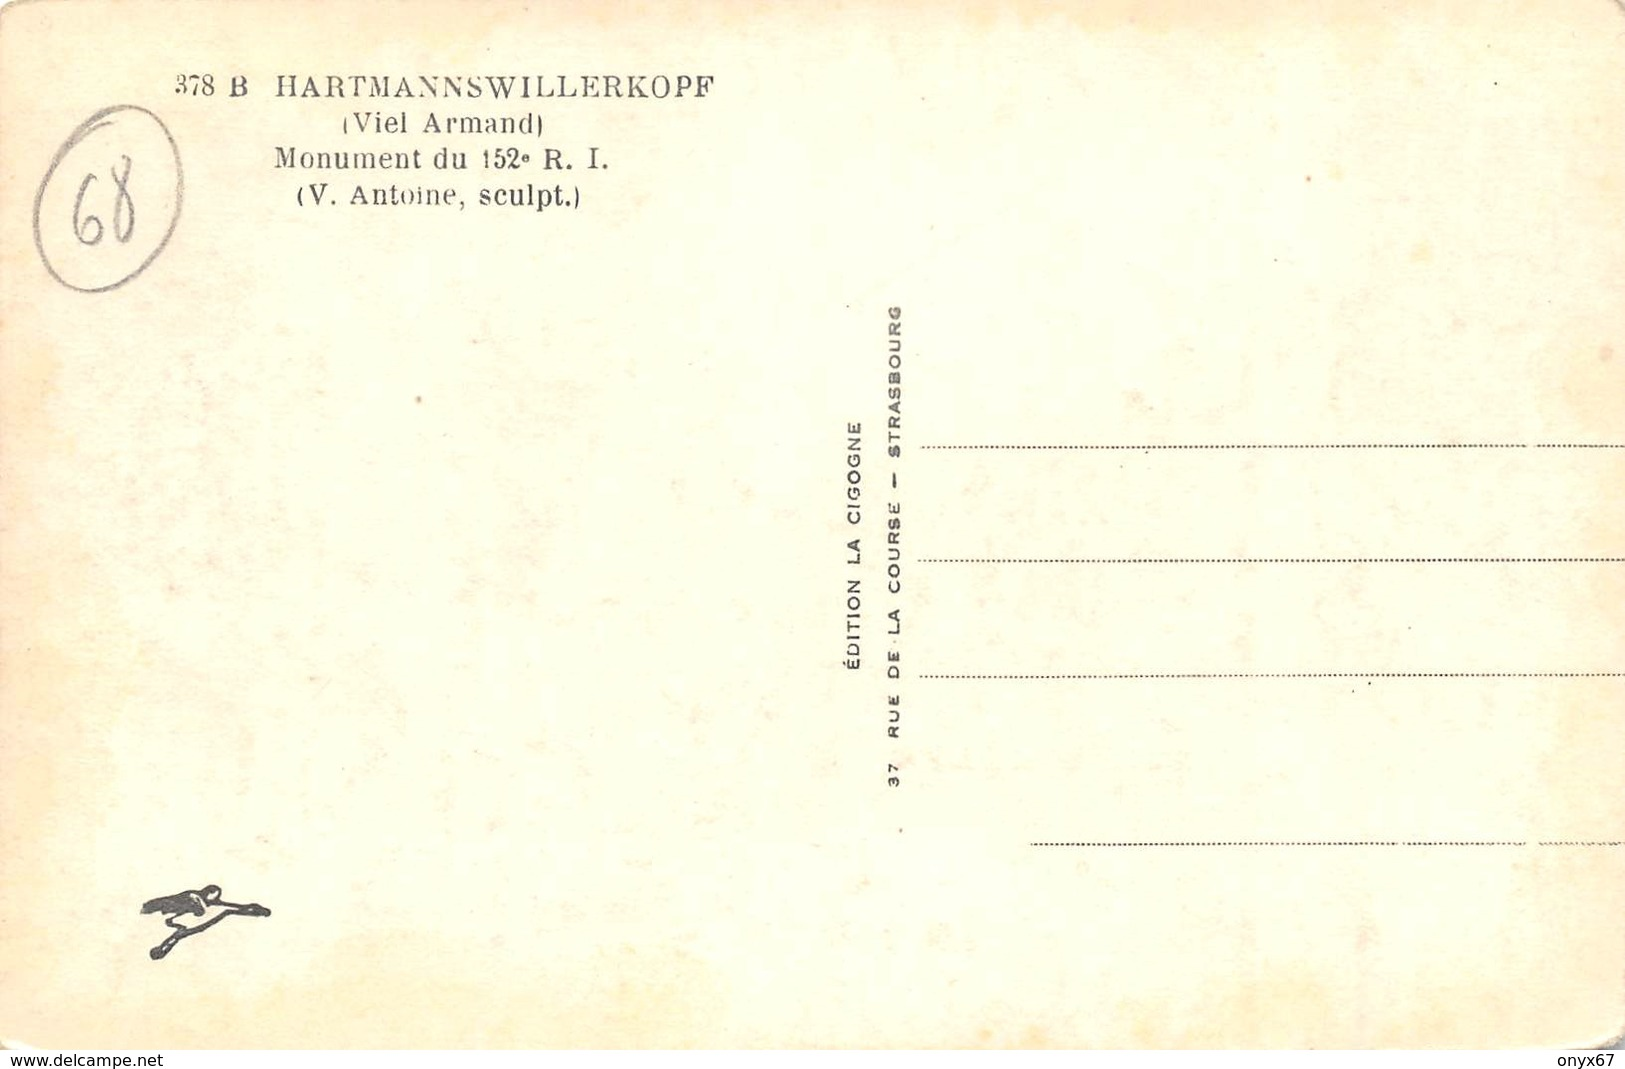 HARTMANNSWILLERKOPF-HARTMANNSWEILER-VIEIL ARMAND Monument 152 E Régiment Infanterie-68-Haut-Rhin-Guerre-Krieg-Militaire - Altri Comuni